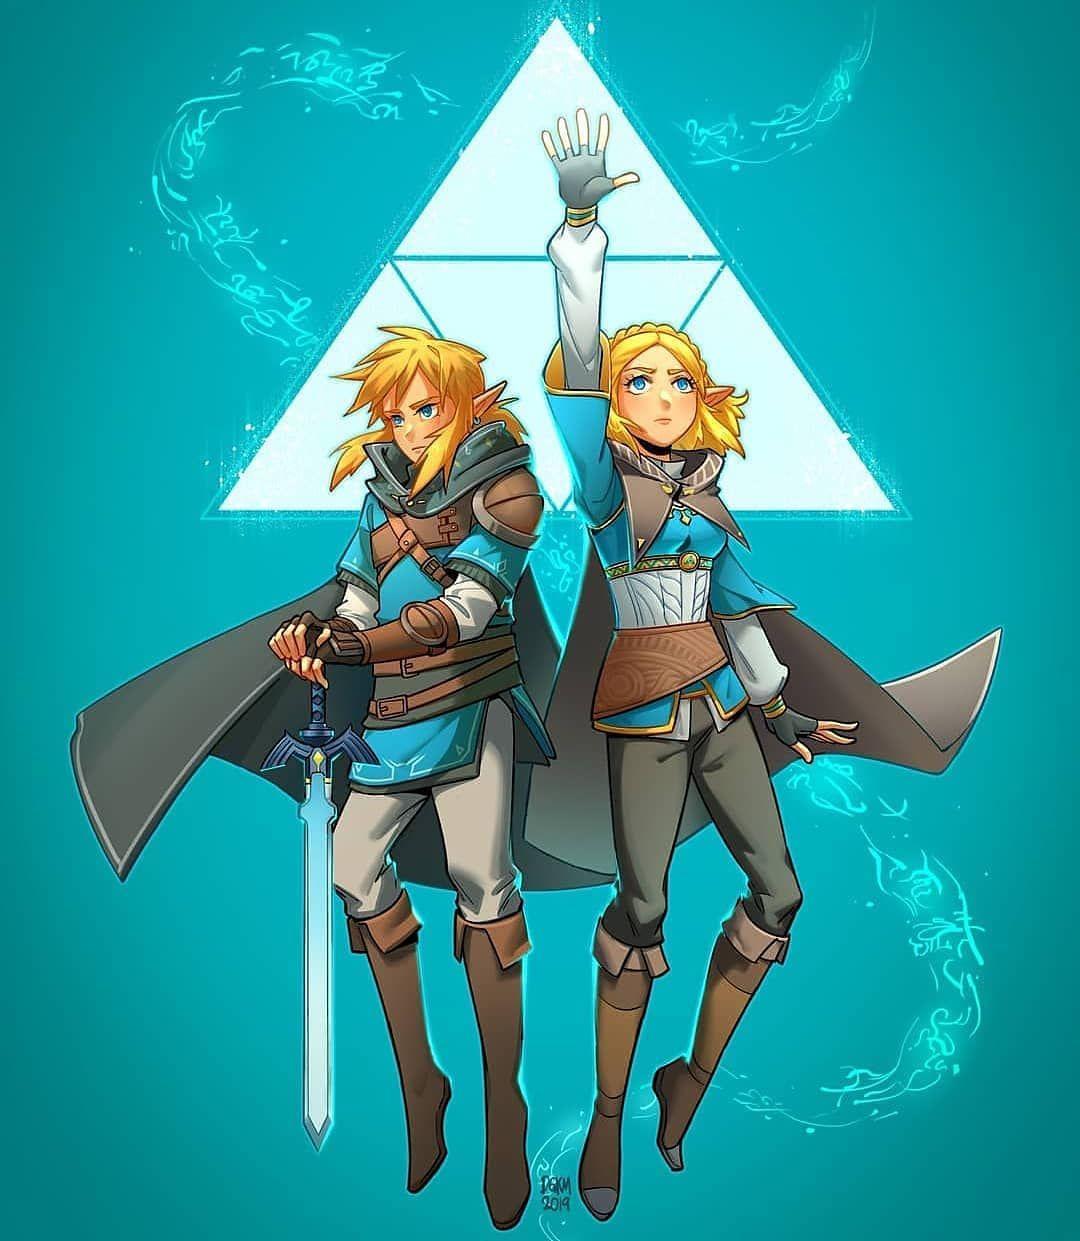 Legend Of Zelda Breath Of The Wild Sequel Art Link And Princess Zelda Triforce Botw 2 Digitkame Legend Of Zelda Breath Legend Of Zelda Beautiful Witch